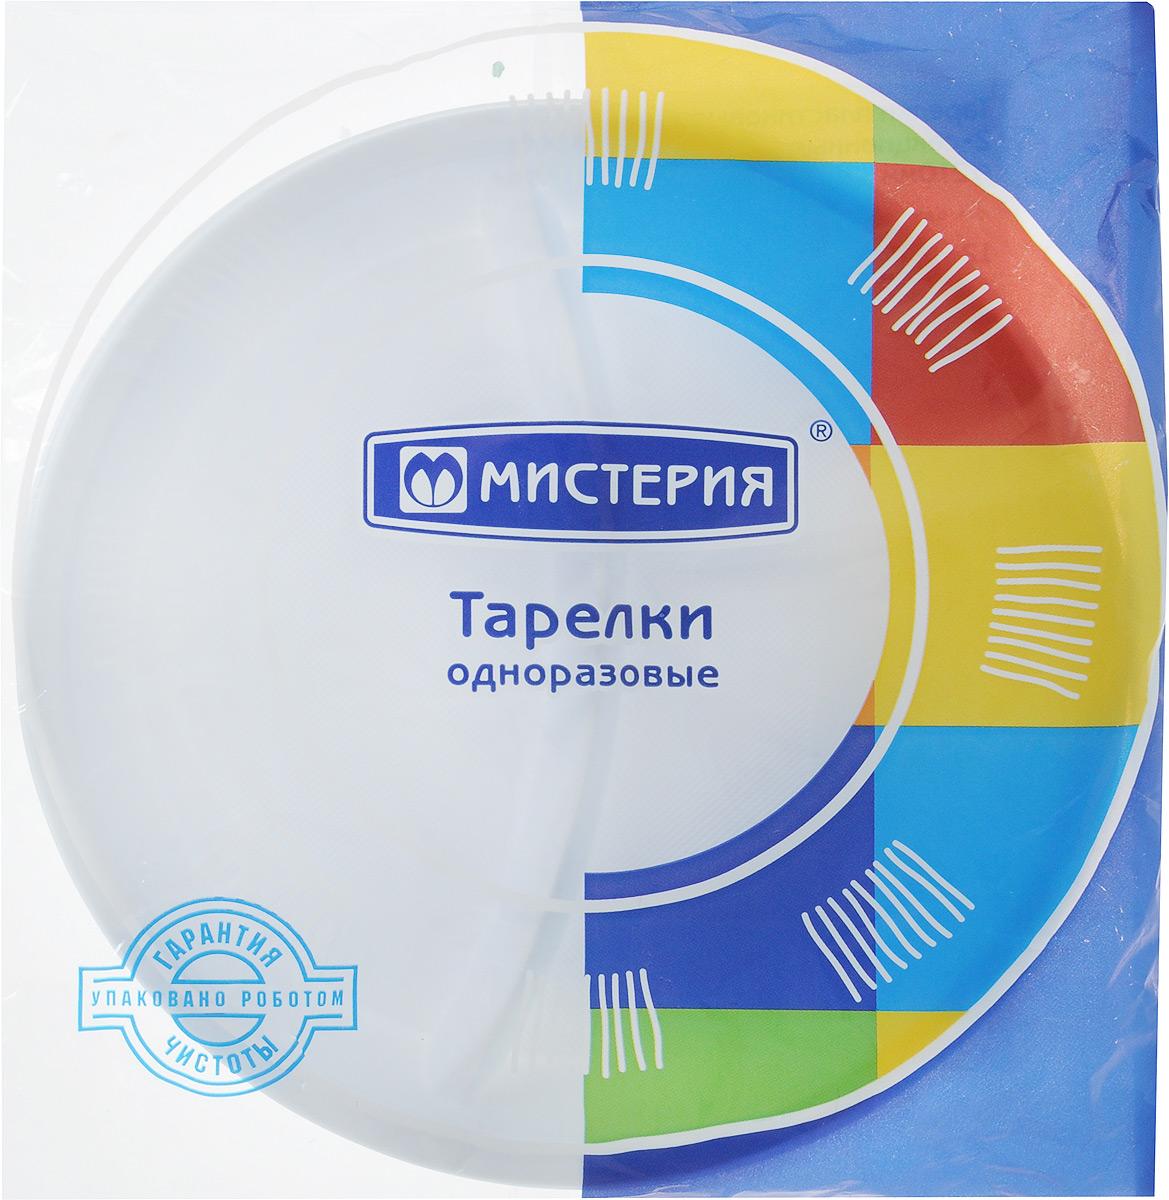 Тарелка одноразовая Мистерия, 2 секции, диаметр 21 см, 12 шт